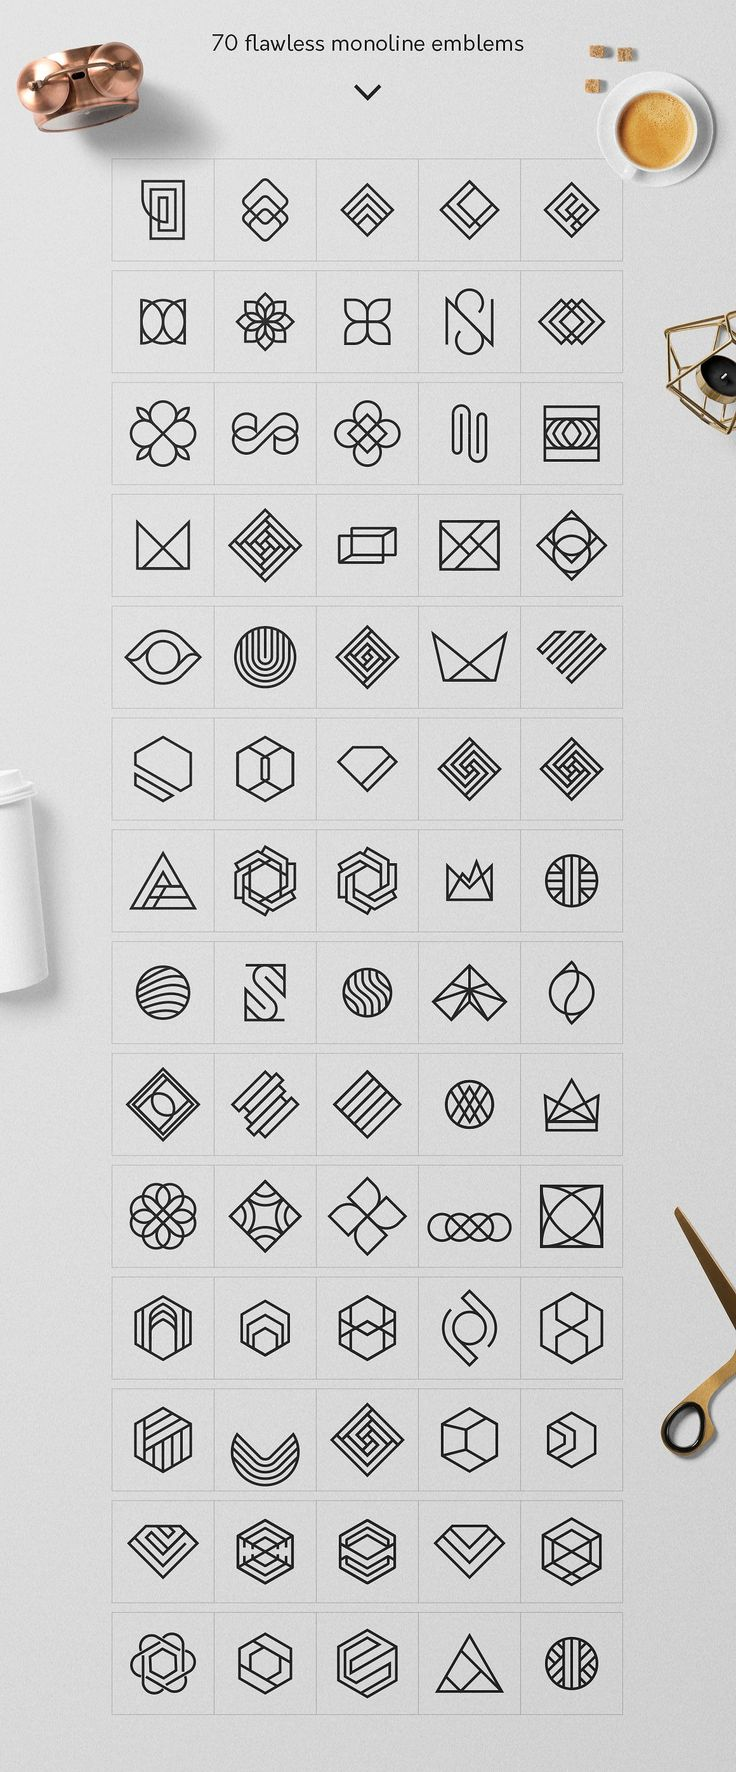 Geometric Logos vol.2 by Davide Bassu on @creativemarket More